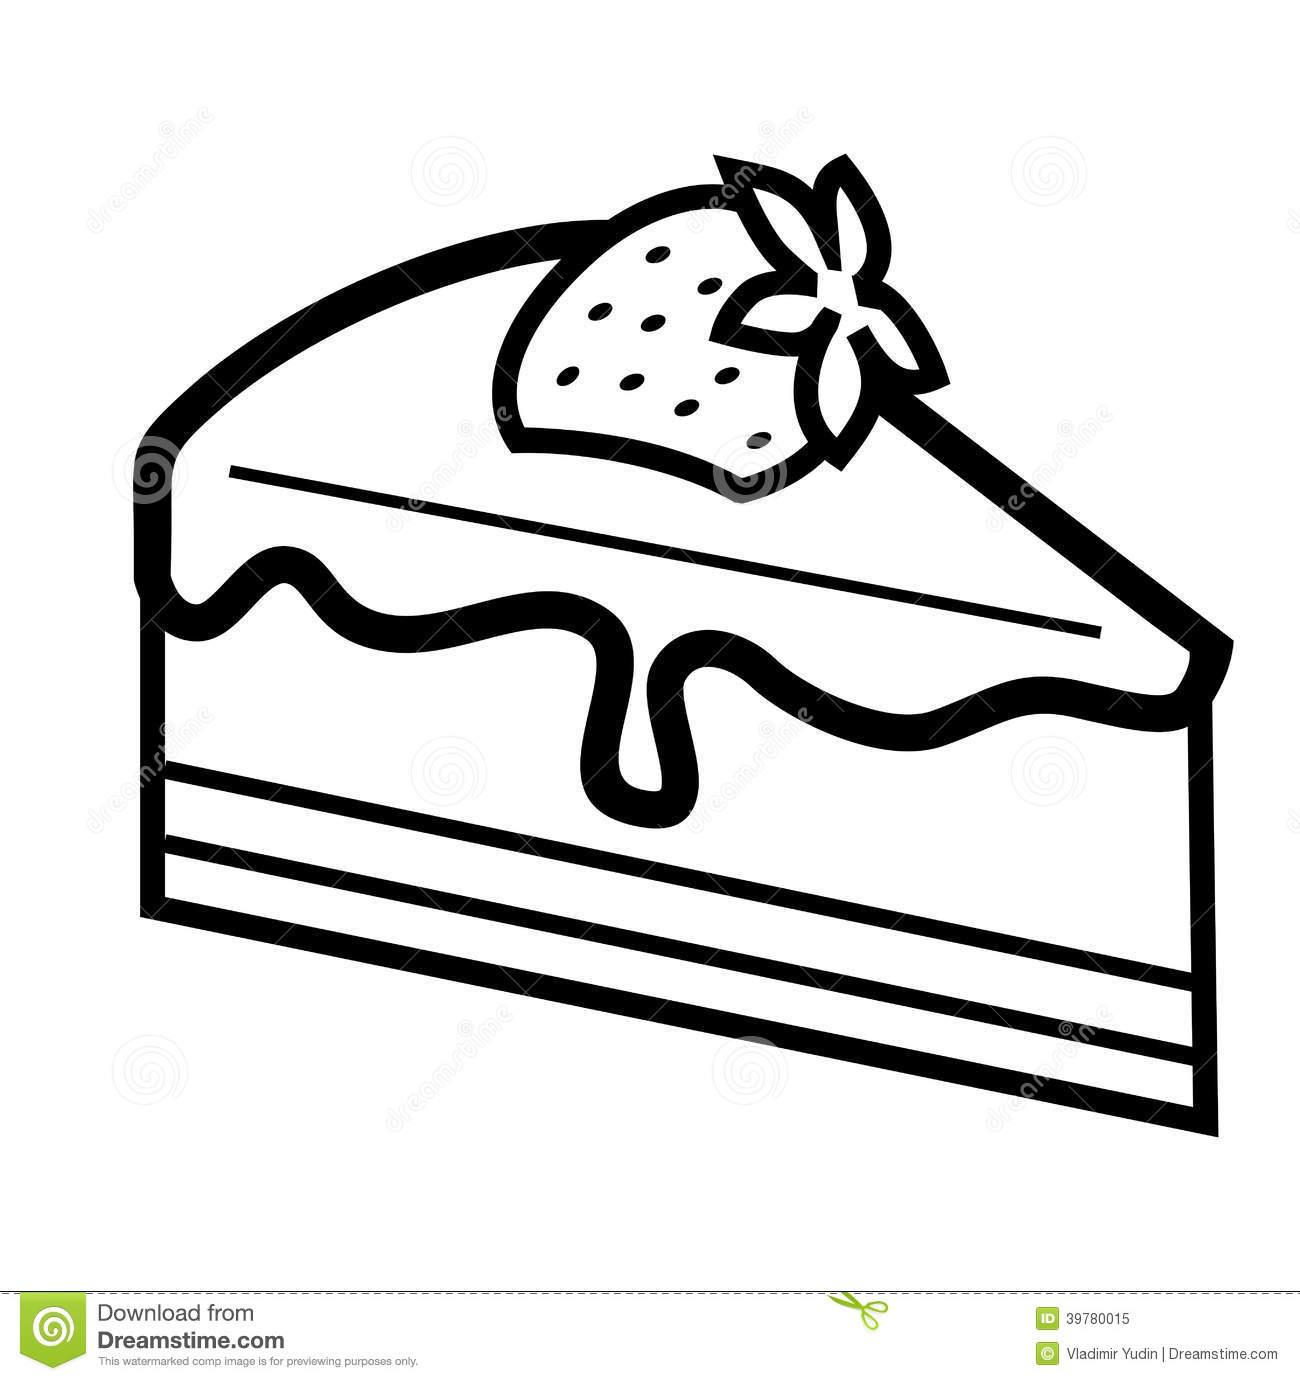 1300x1381 Sponge Cake Clipart Black And White